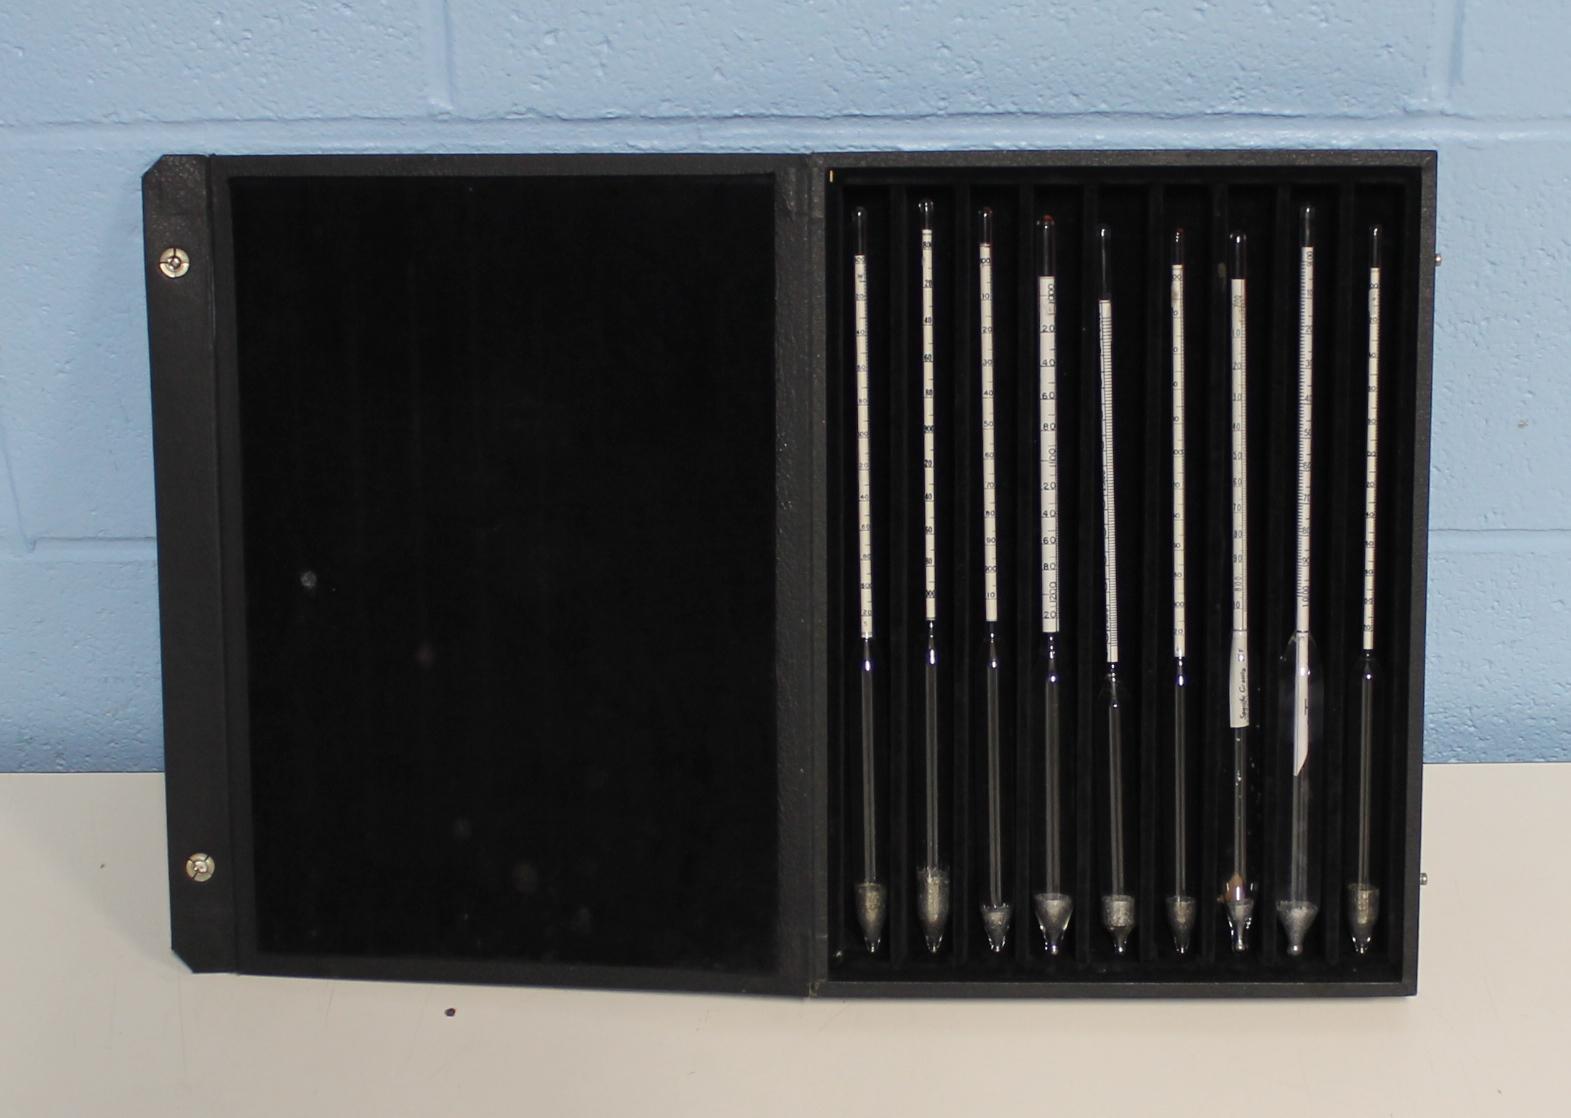 Fisherbrand Ertco Specific Gravity Hydrometer Set (9 Pcs) Image